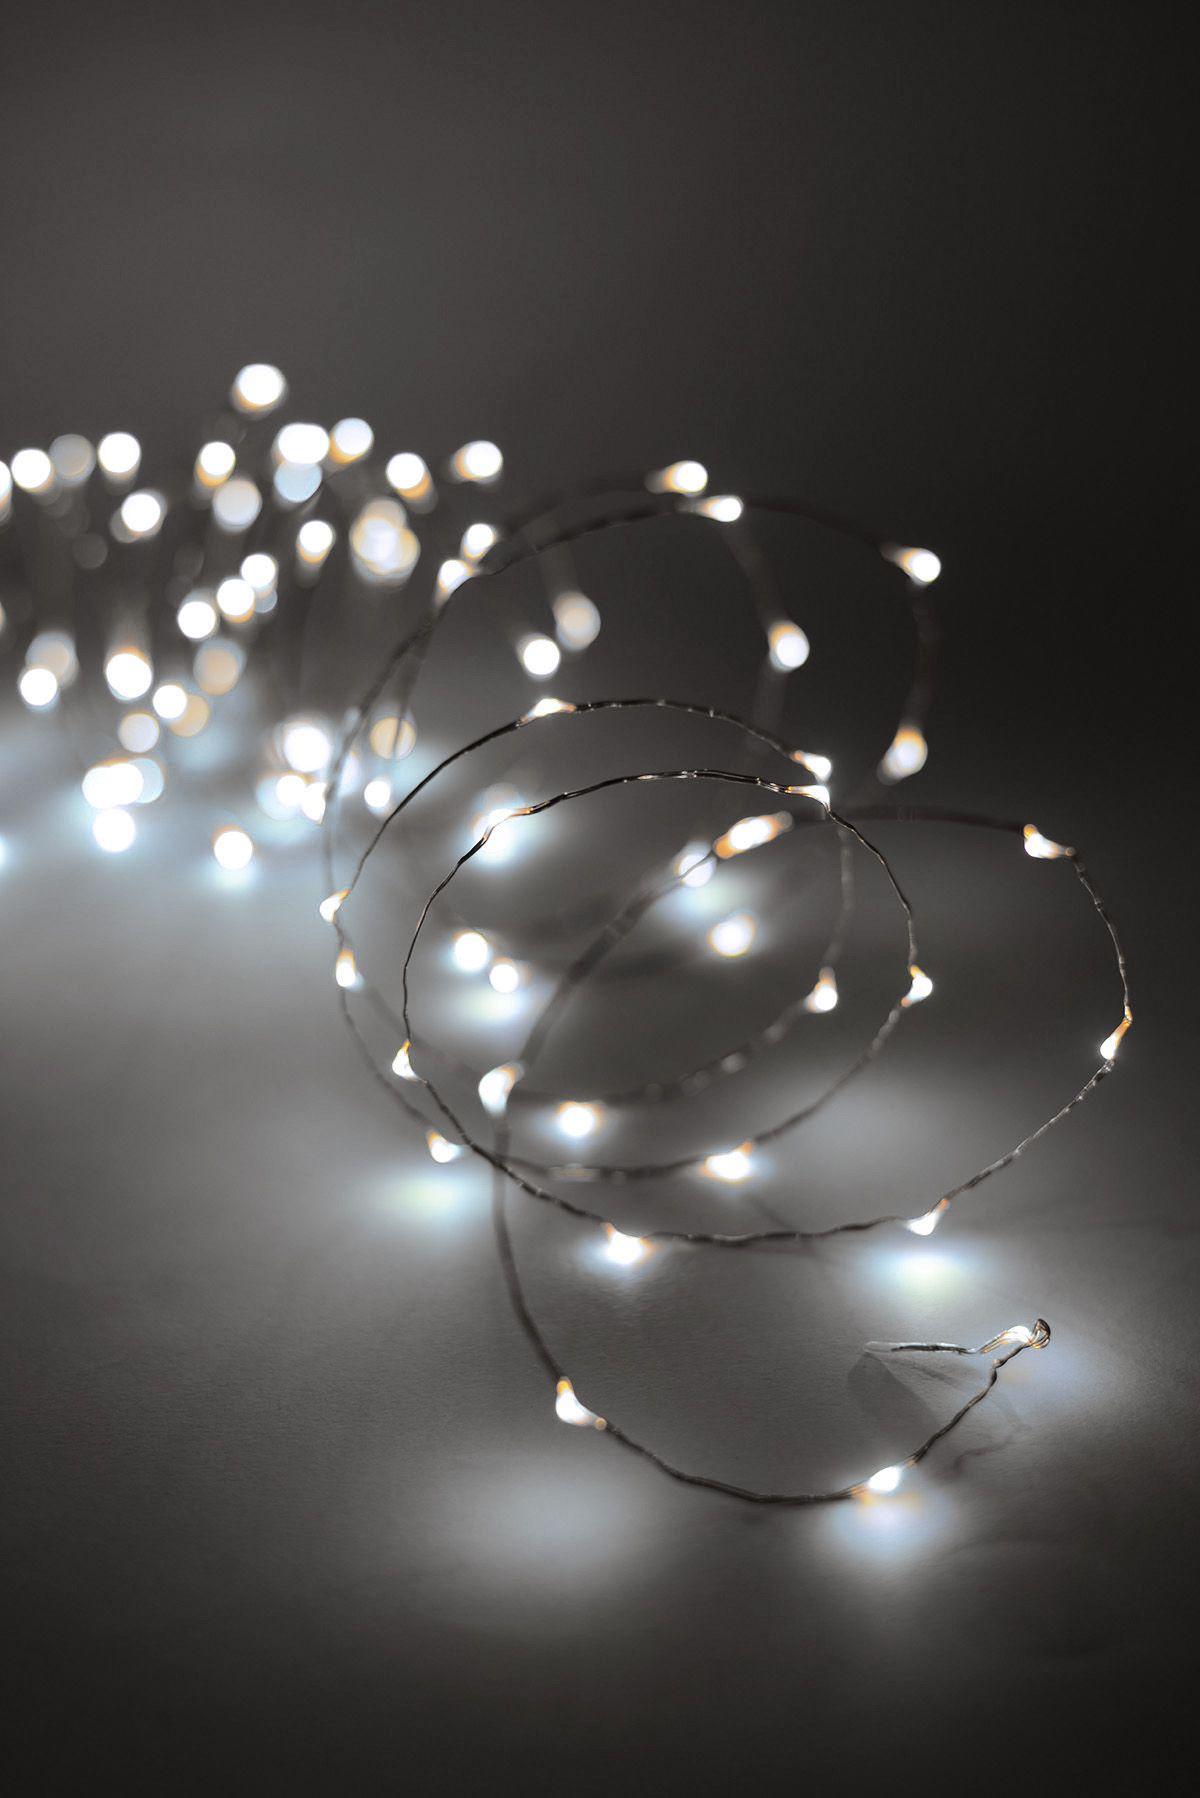 Cool white firefly lights | Pinterest | Fireflies, Starry night ...